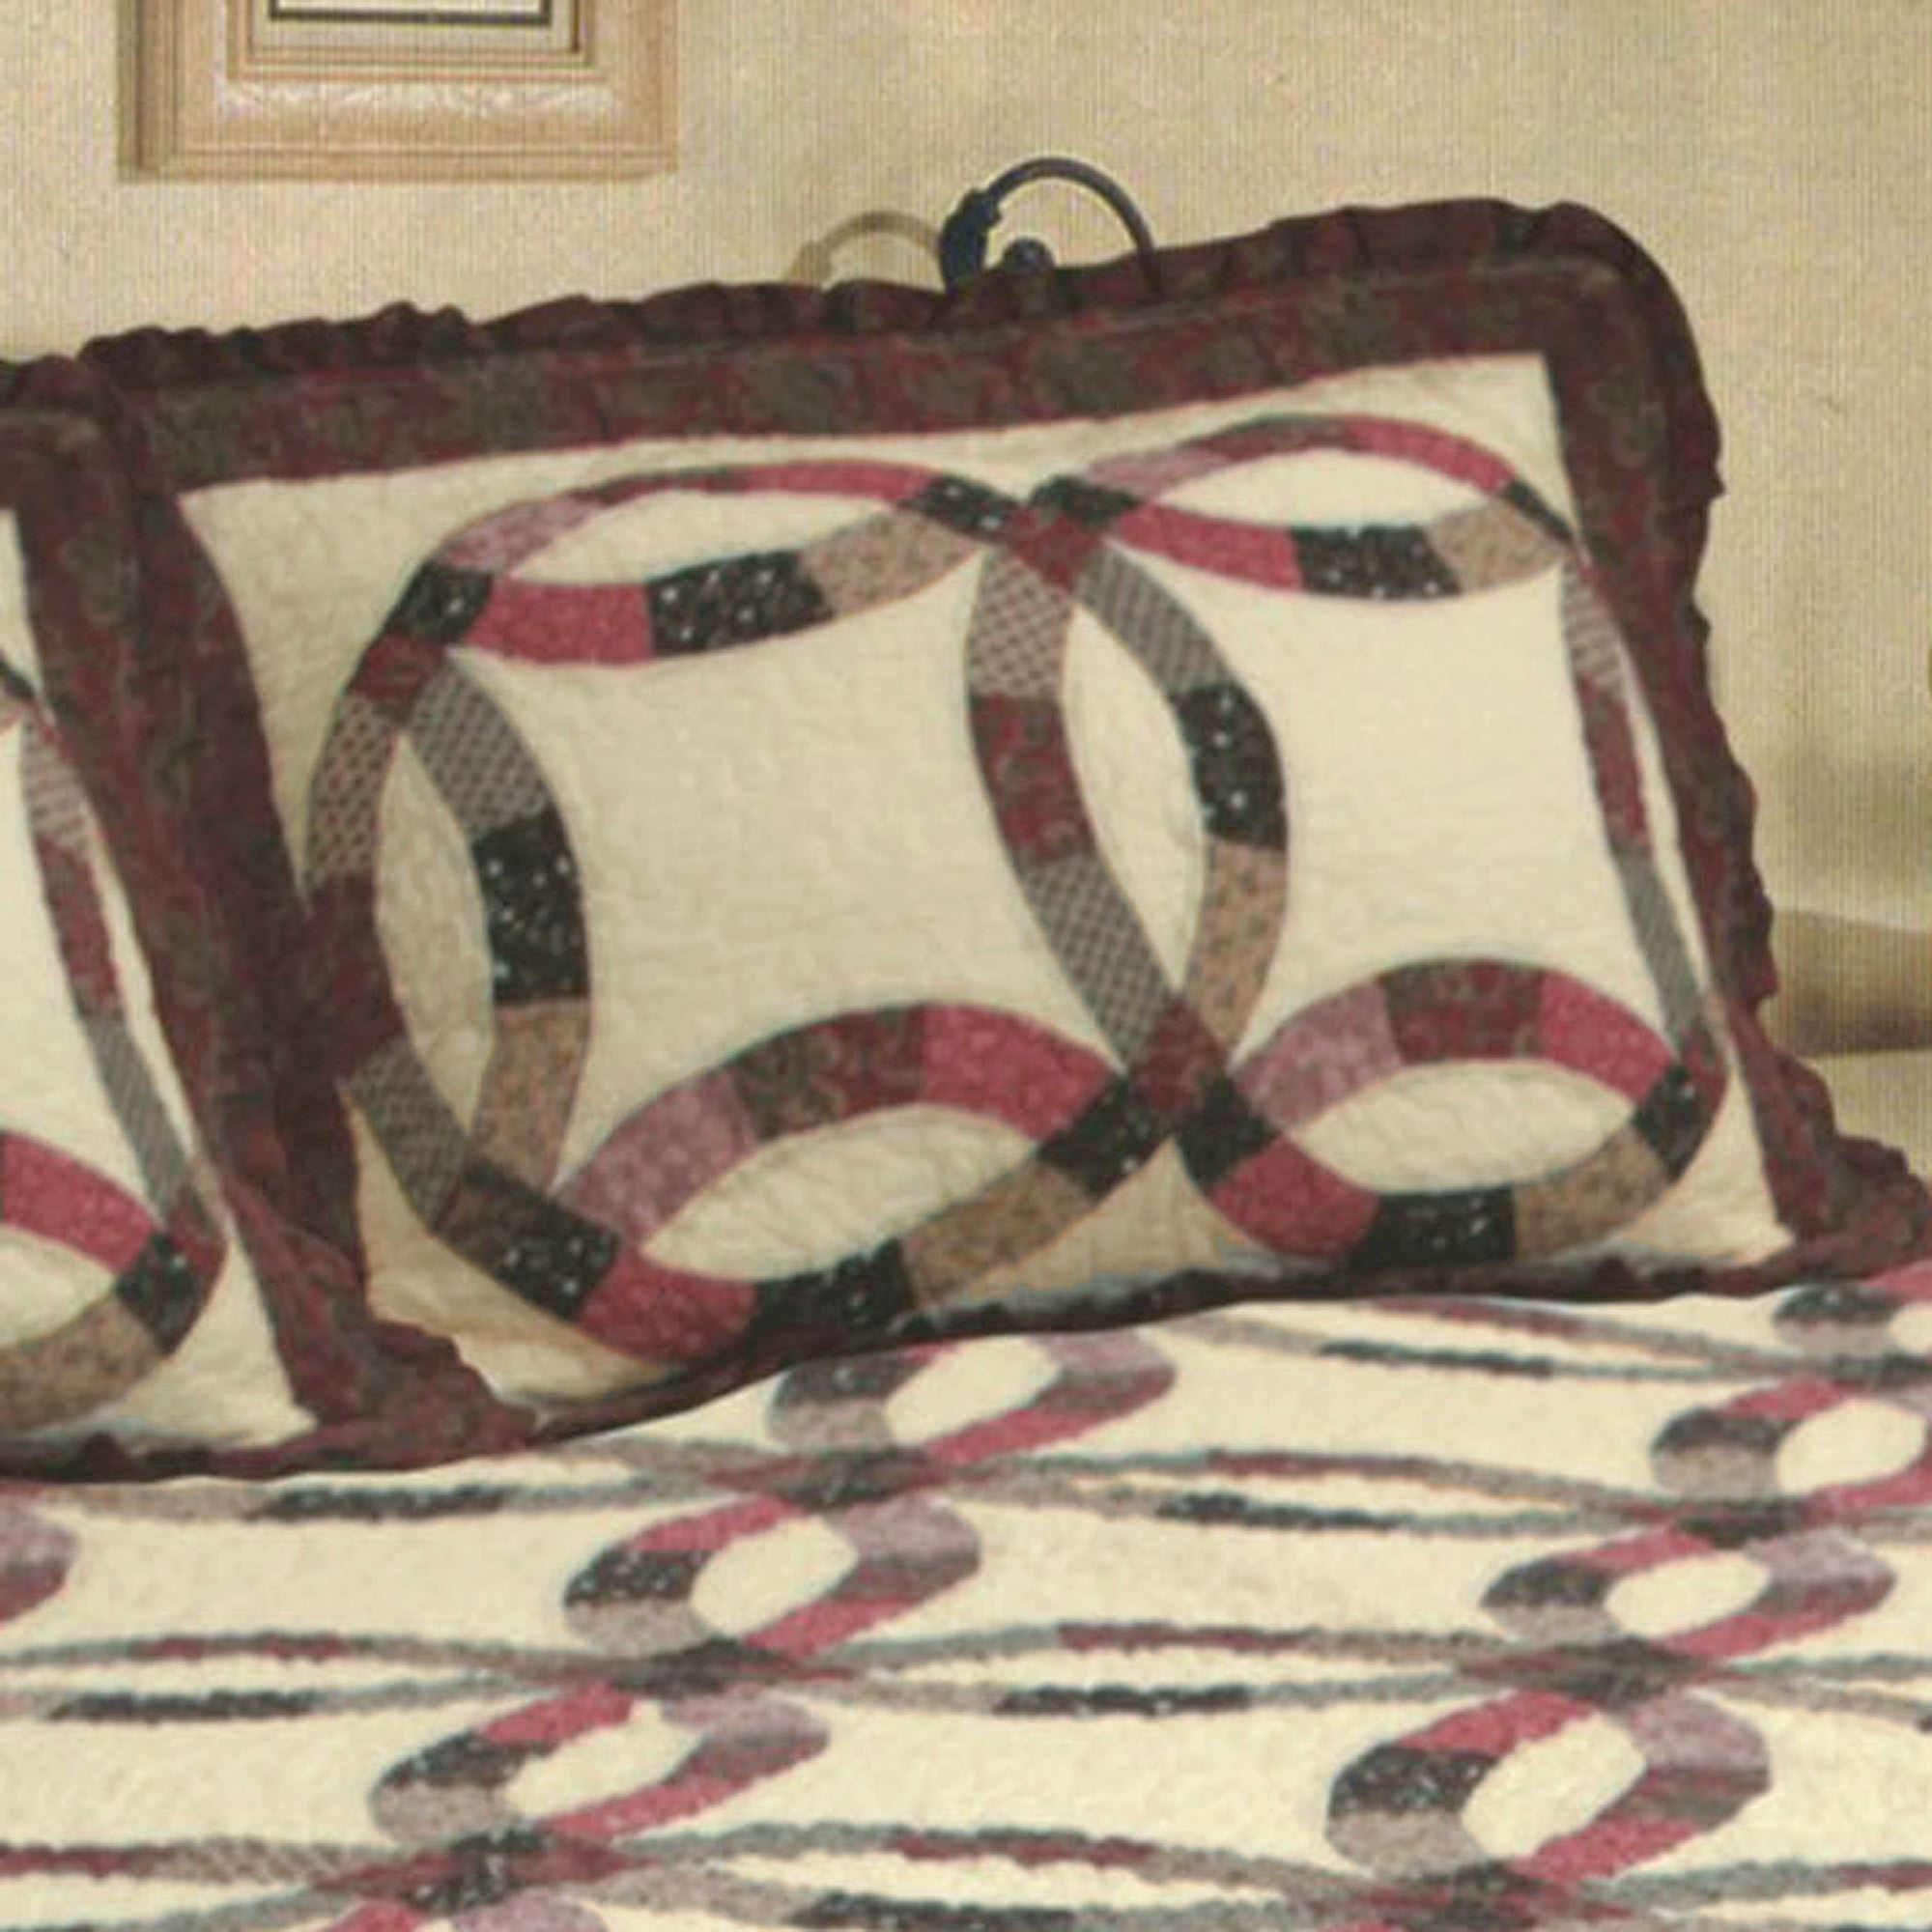 Heritage Cotton Wedding Ring Quilt Bedding